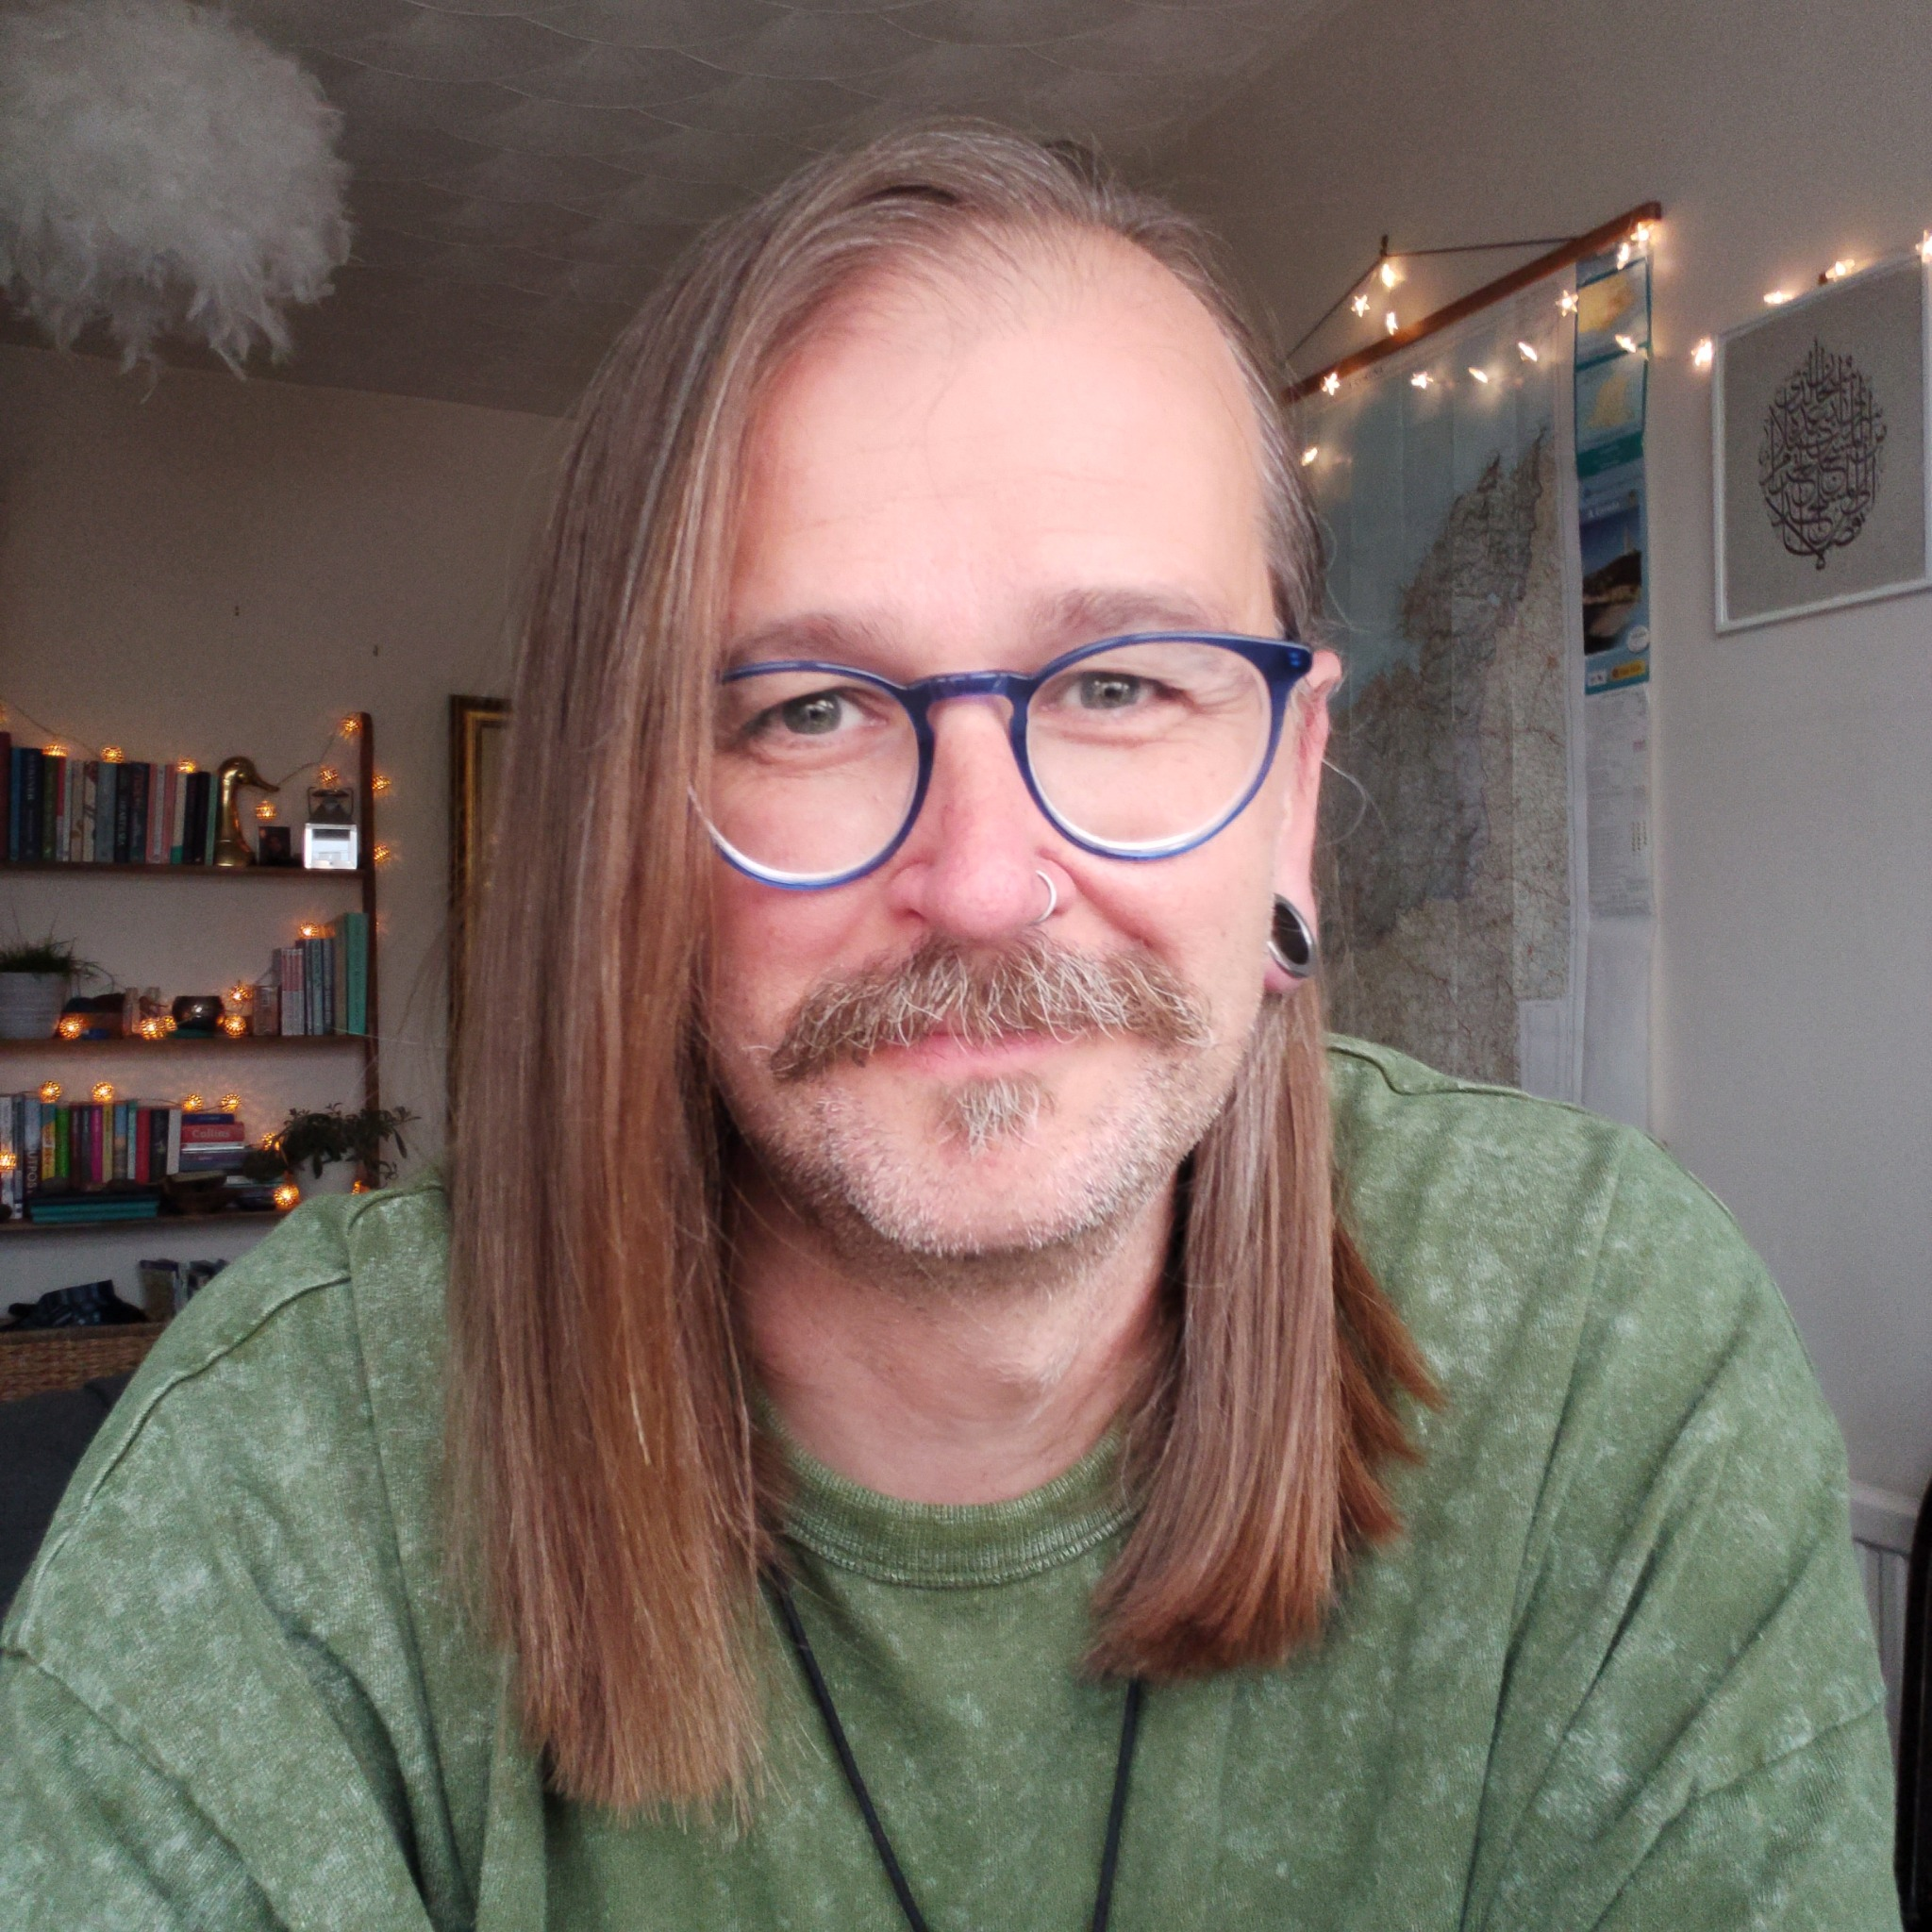 Portrait of Dru Jaeger